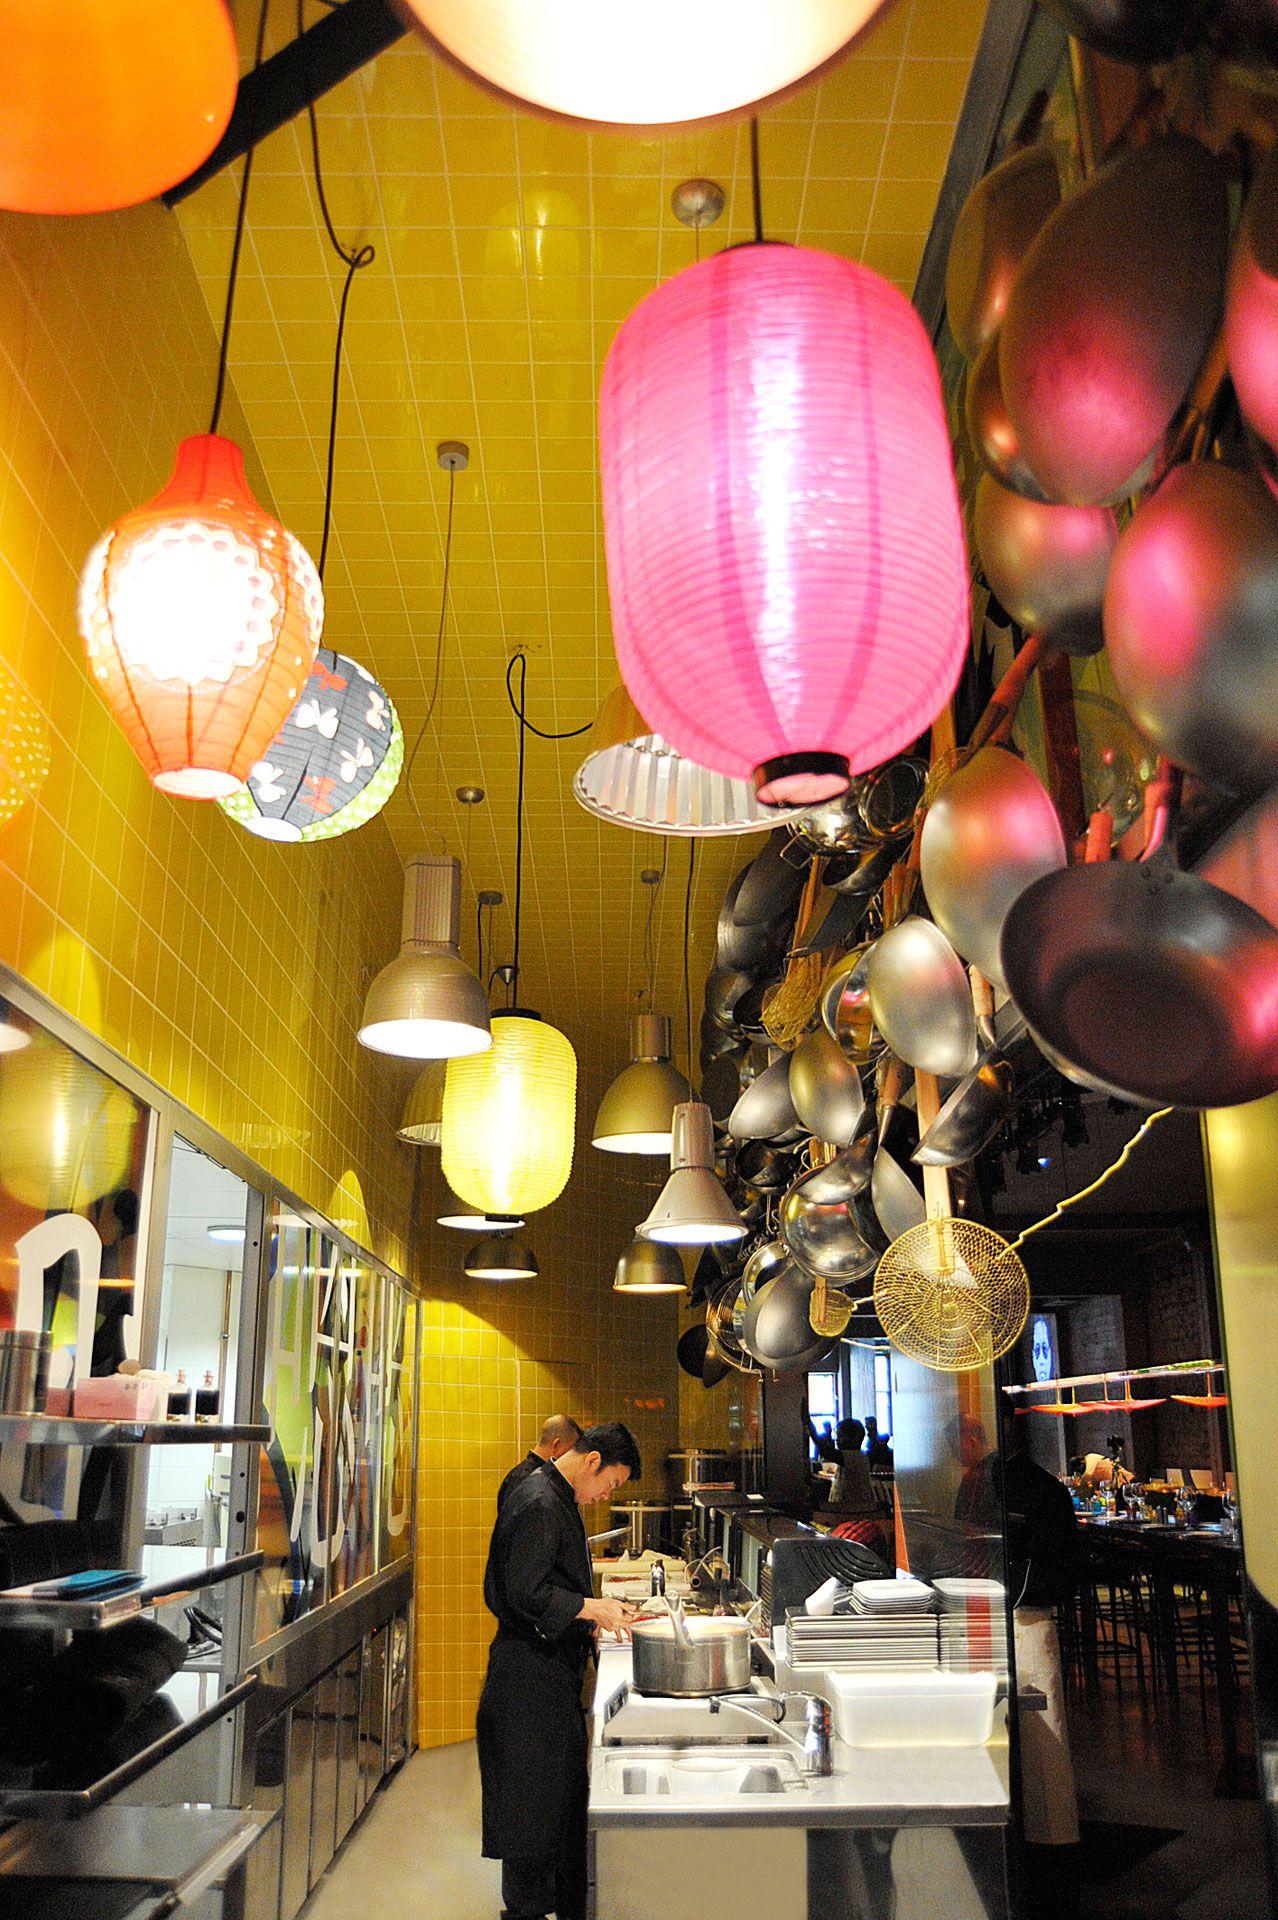 mlle ko - restaurant paris 8 - restaurant gastronomique sur paris